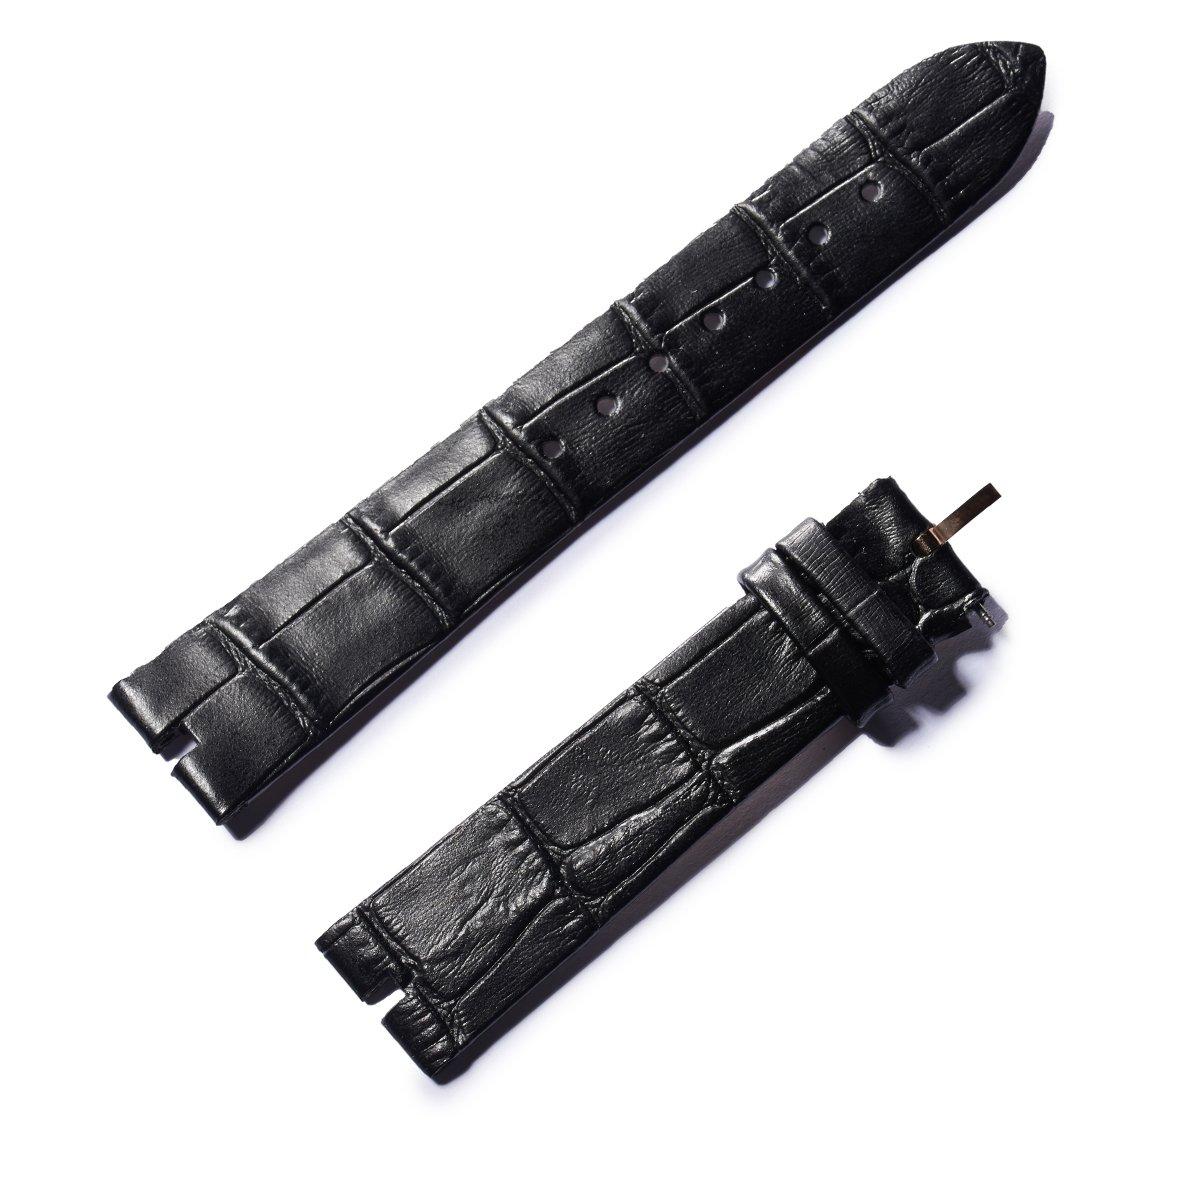 REEF TIGER RT Womens Watch Genuine Leather Strap with Buckle Waterproof Black Calfskin Watch Strap RGA151